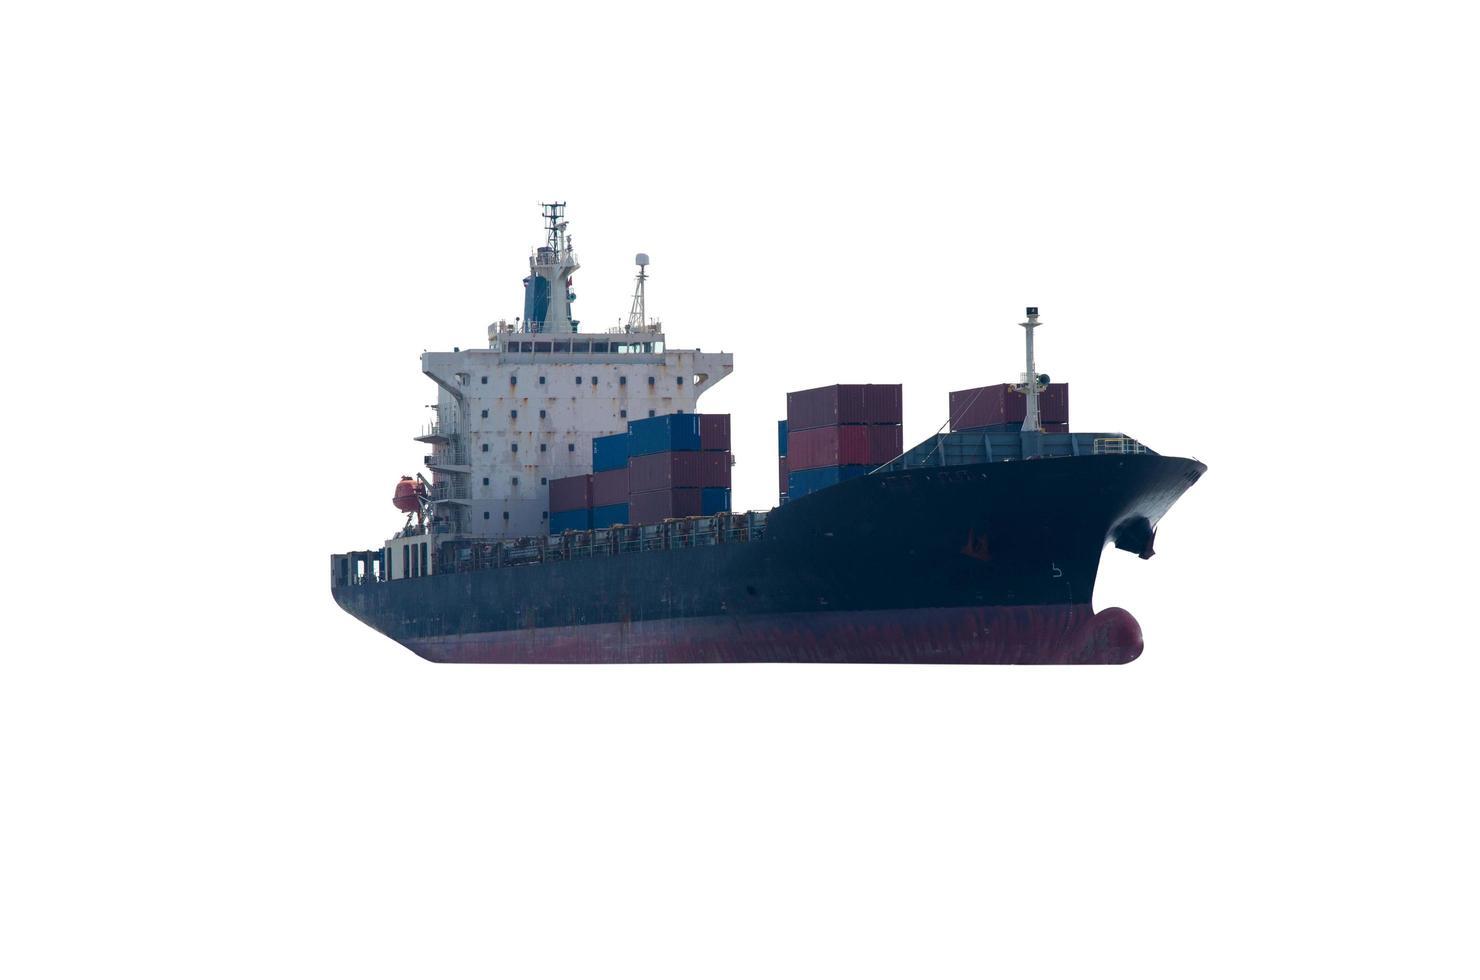 container vrachtschip op witte achtergrond foto